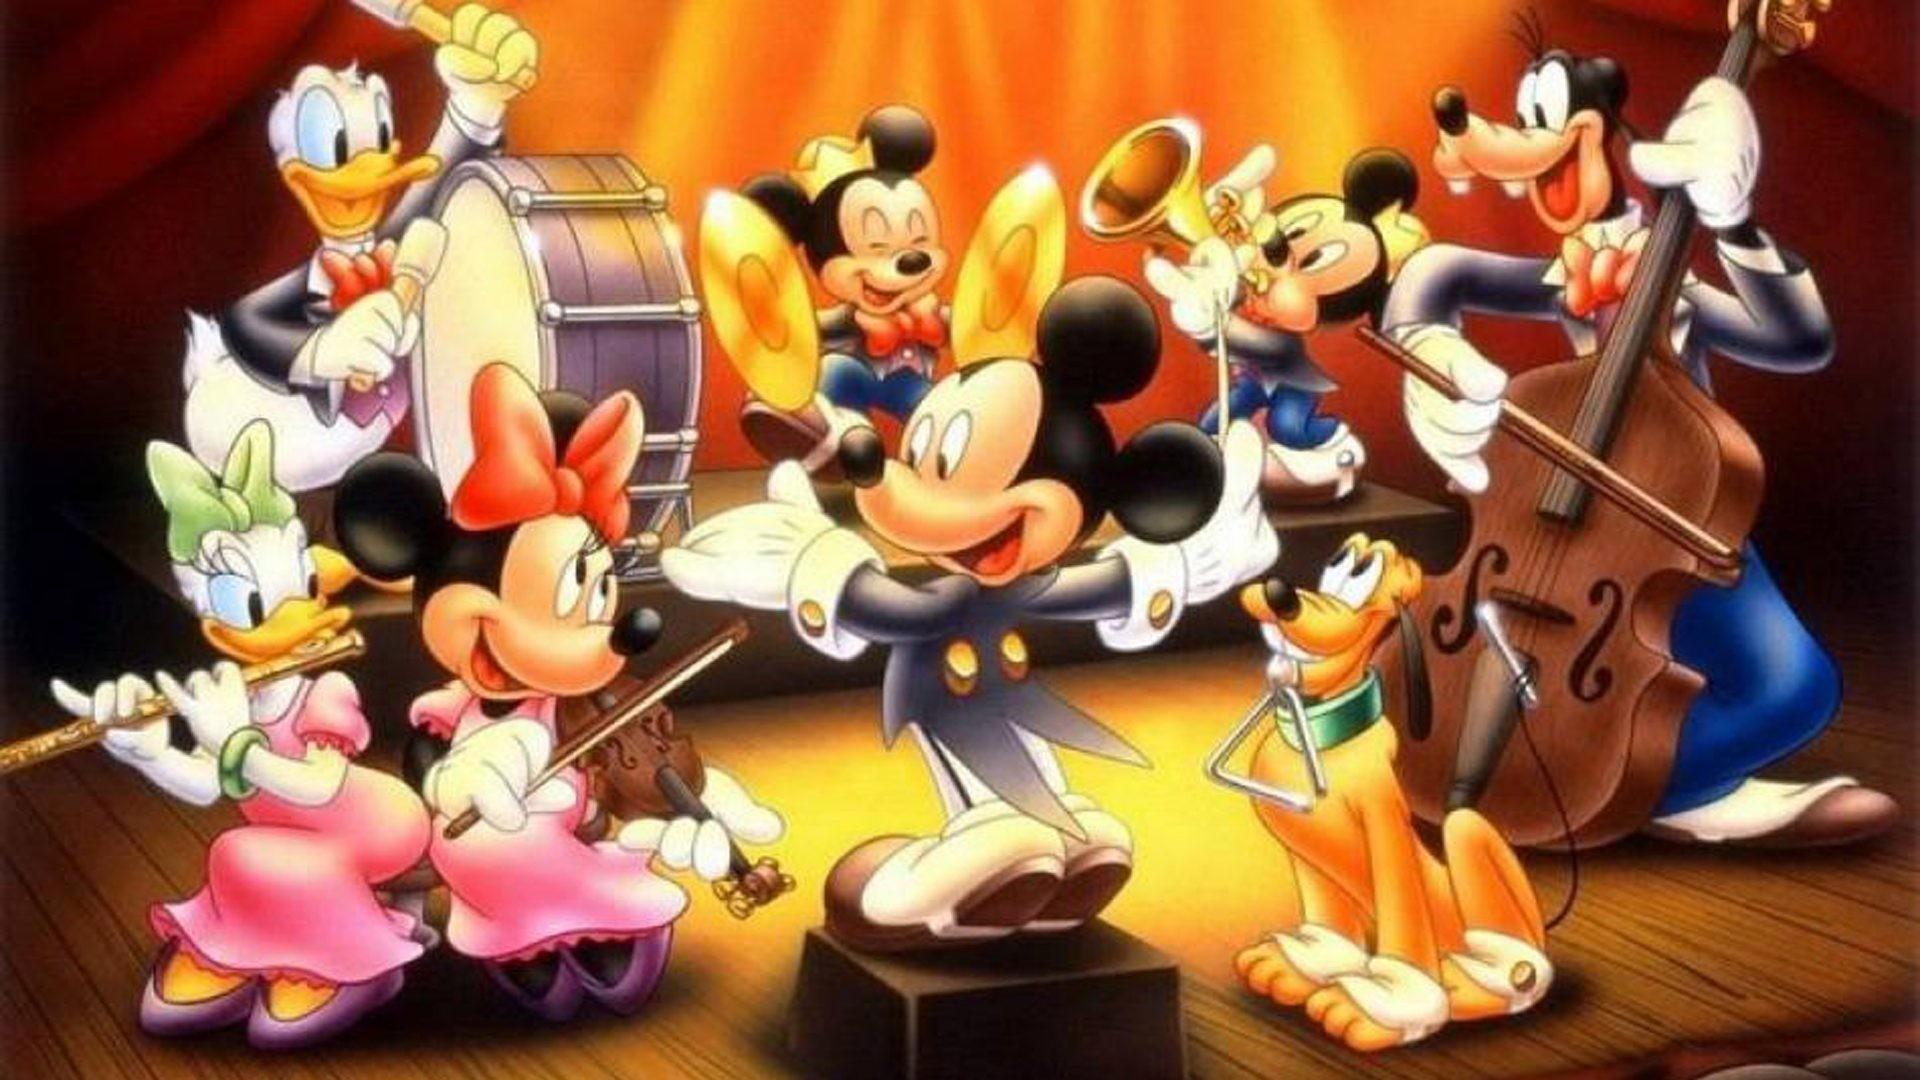 Disney Character Wallpaper (74+ pictures)